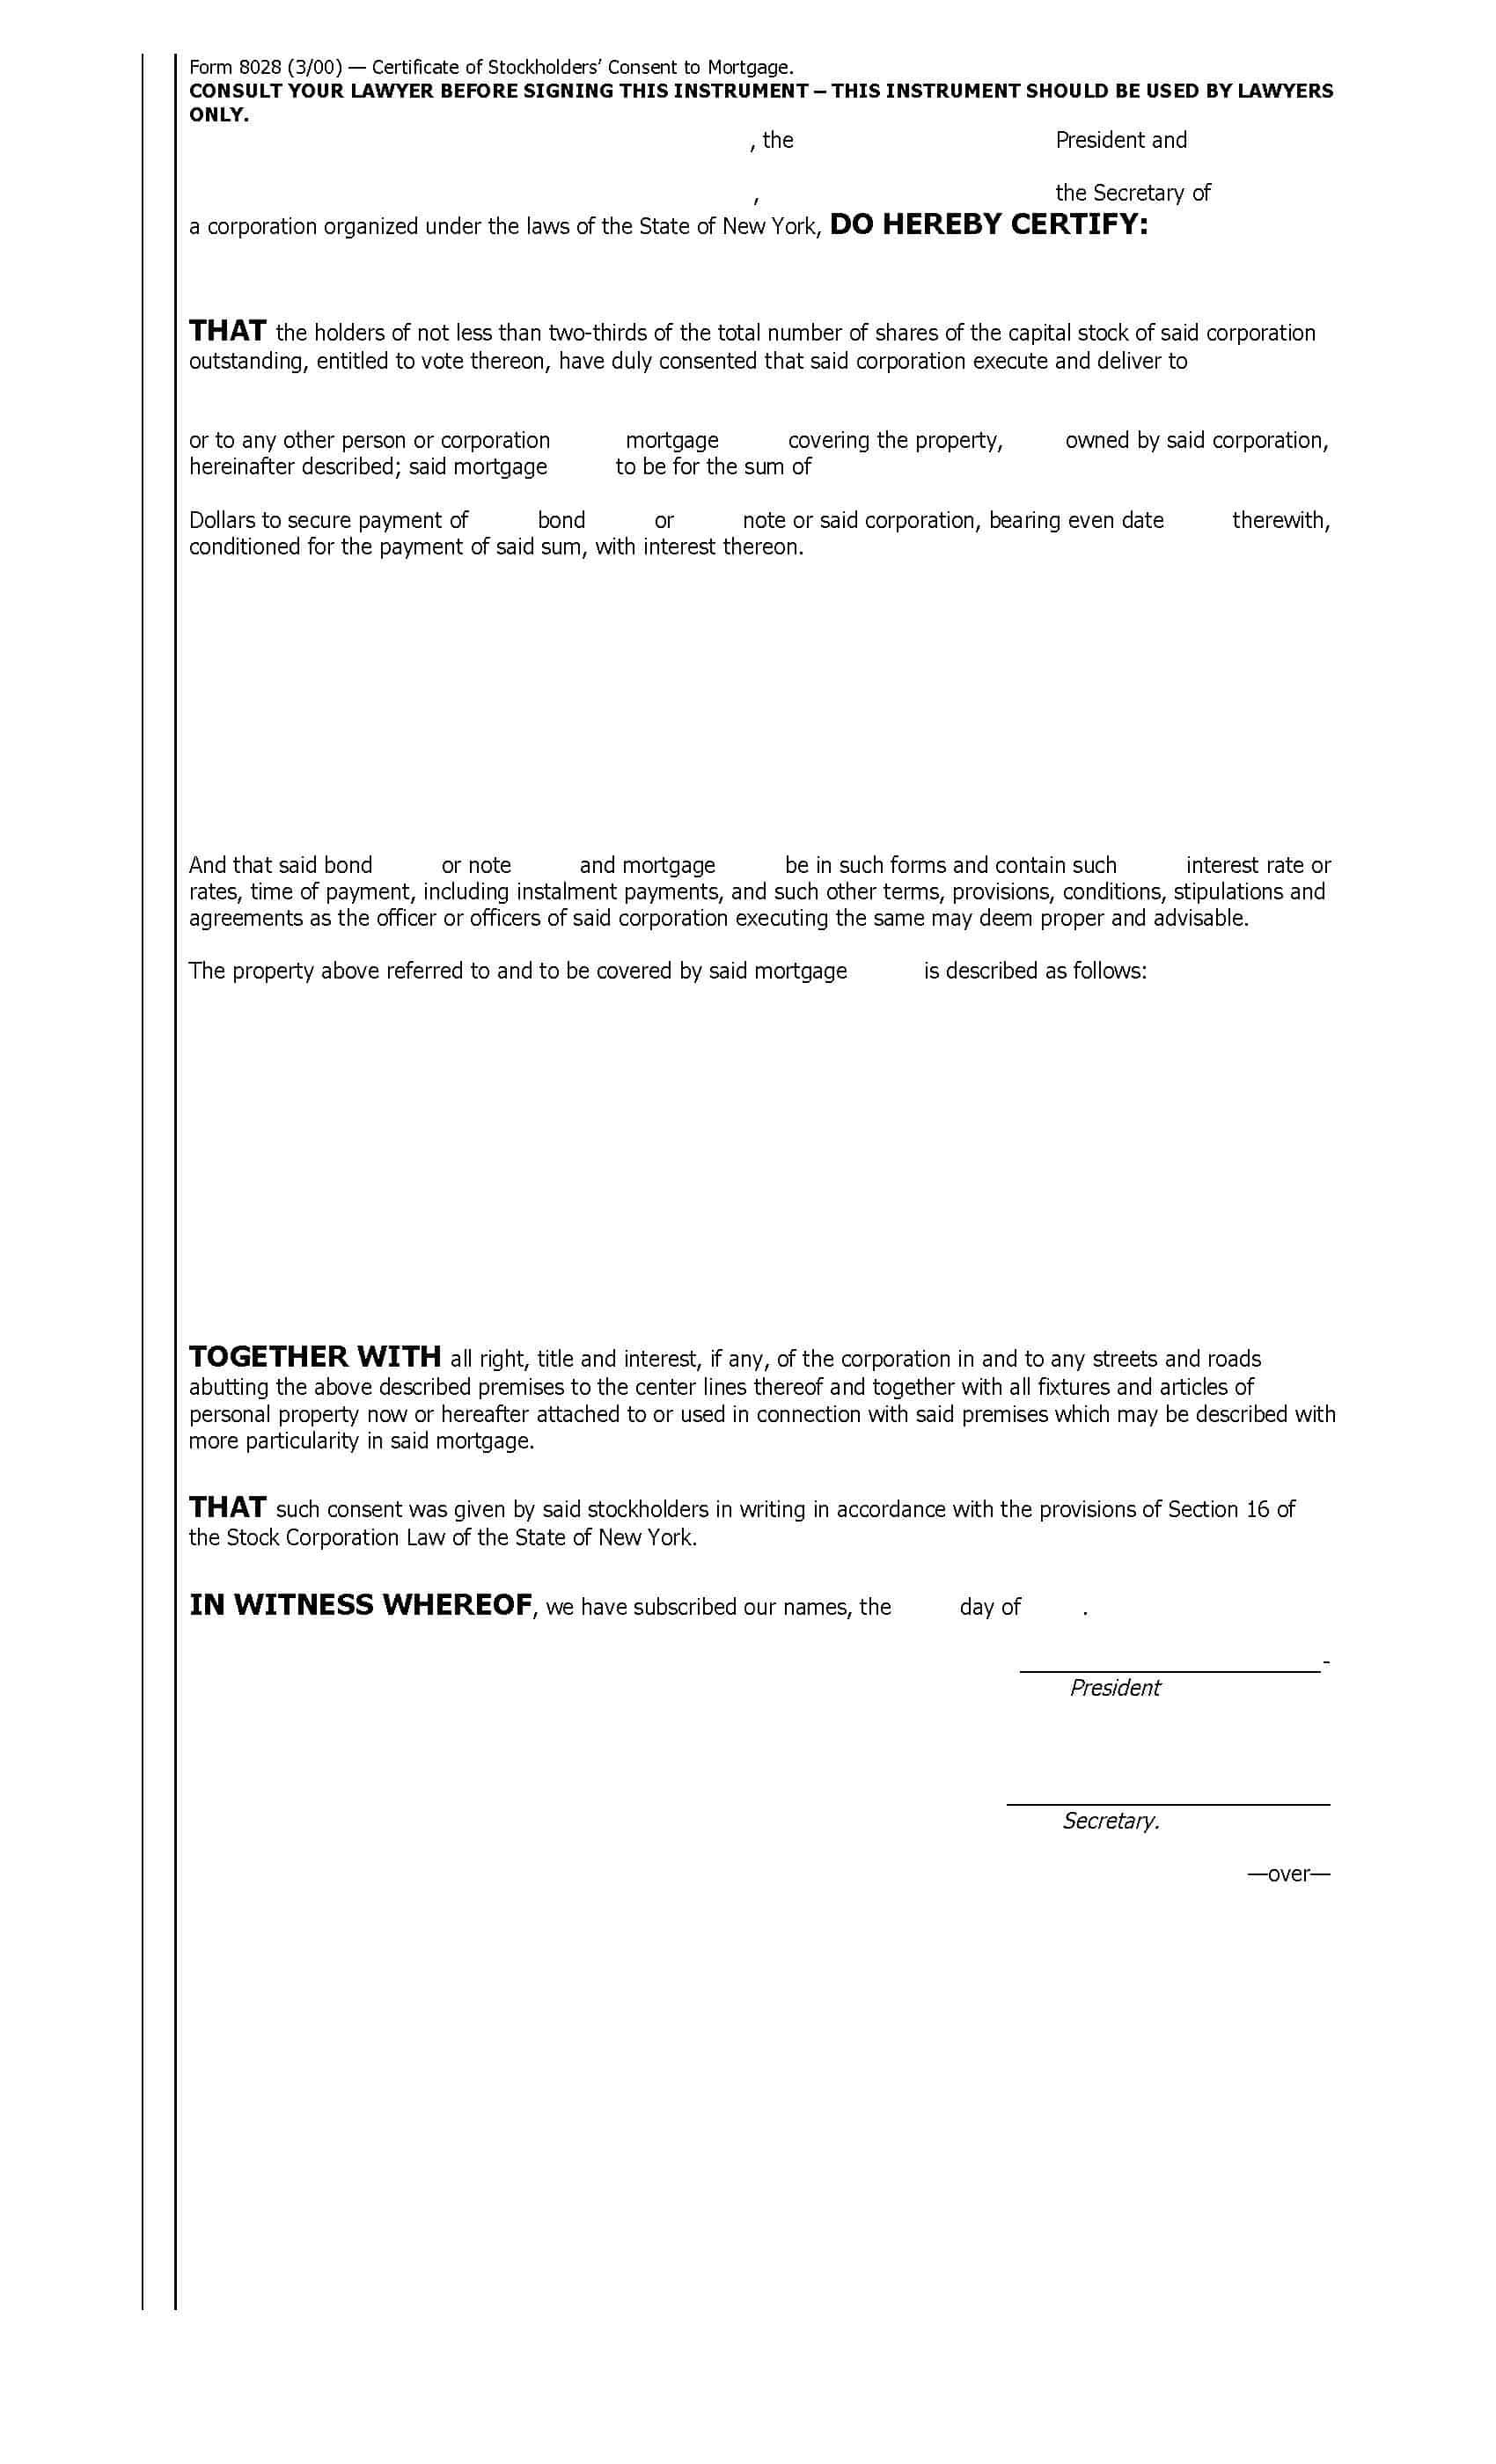 NY Abstract Company Forms | New York Title Insurance ...